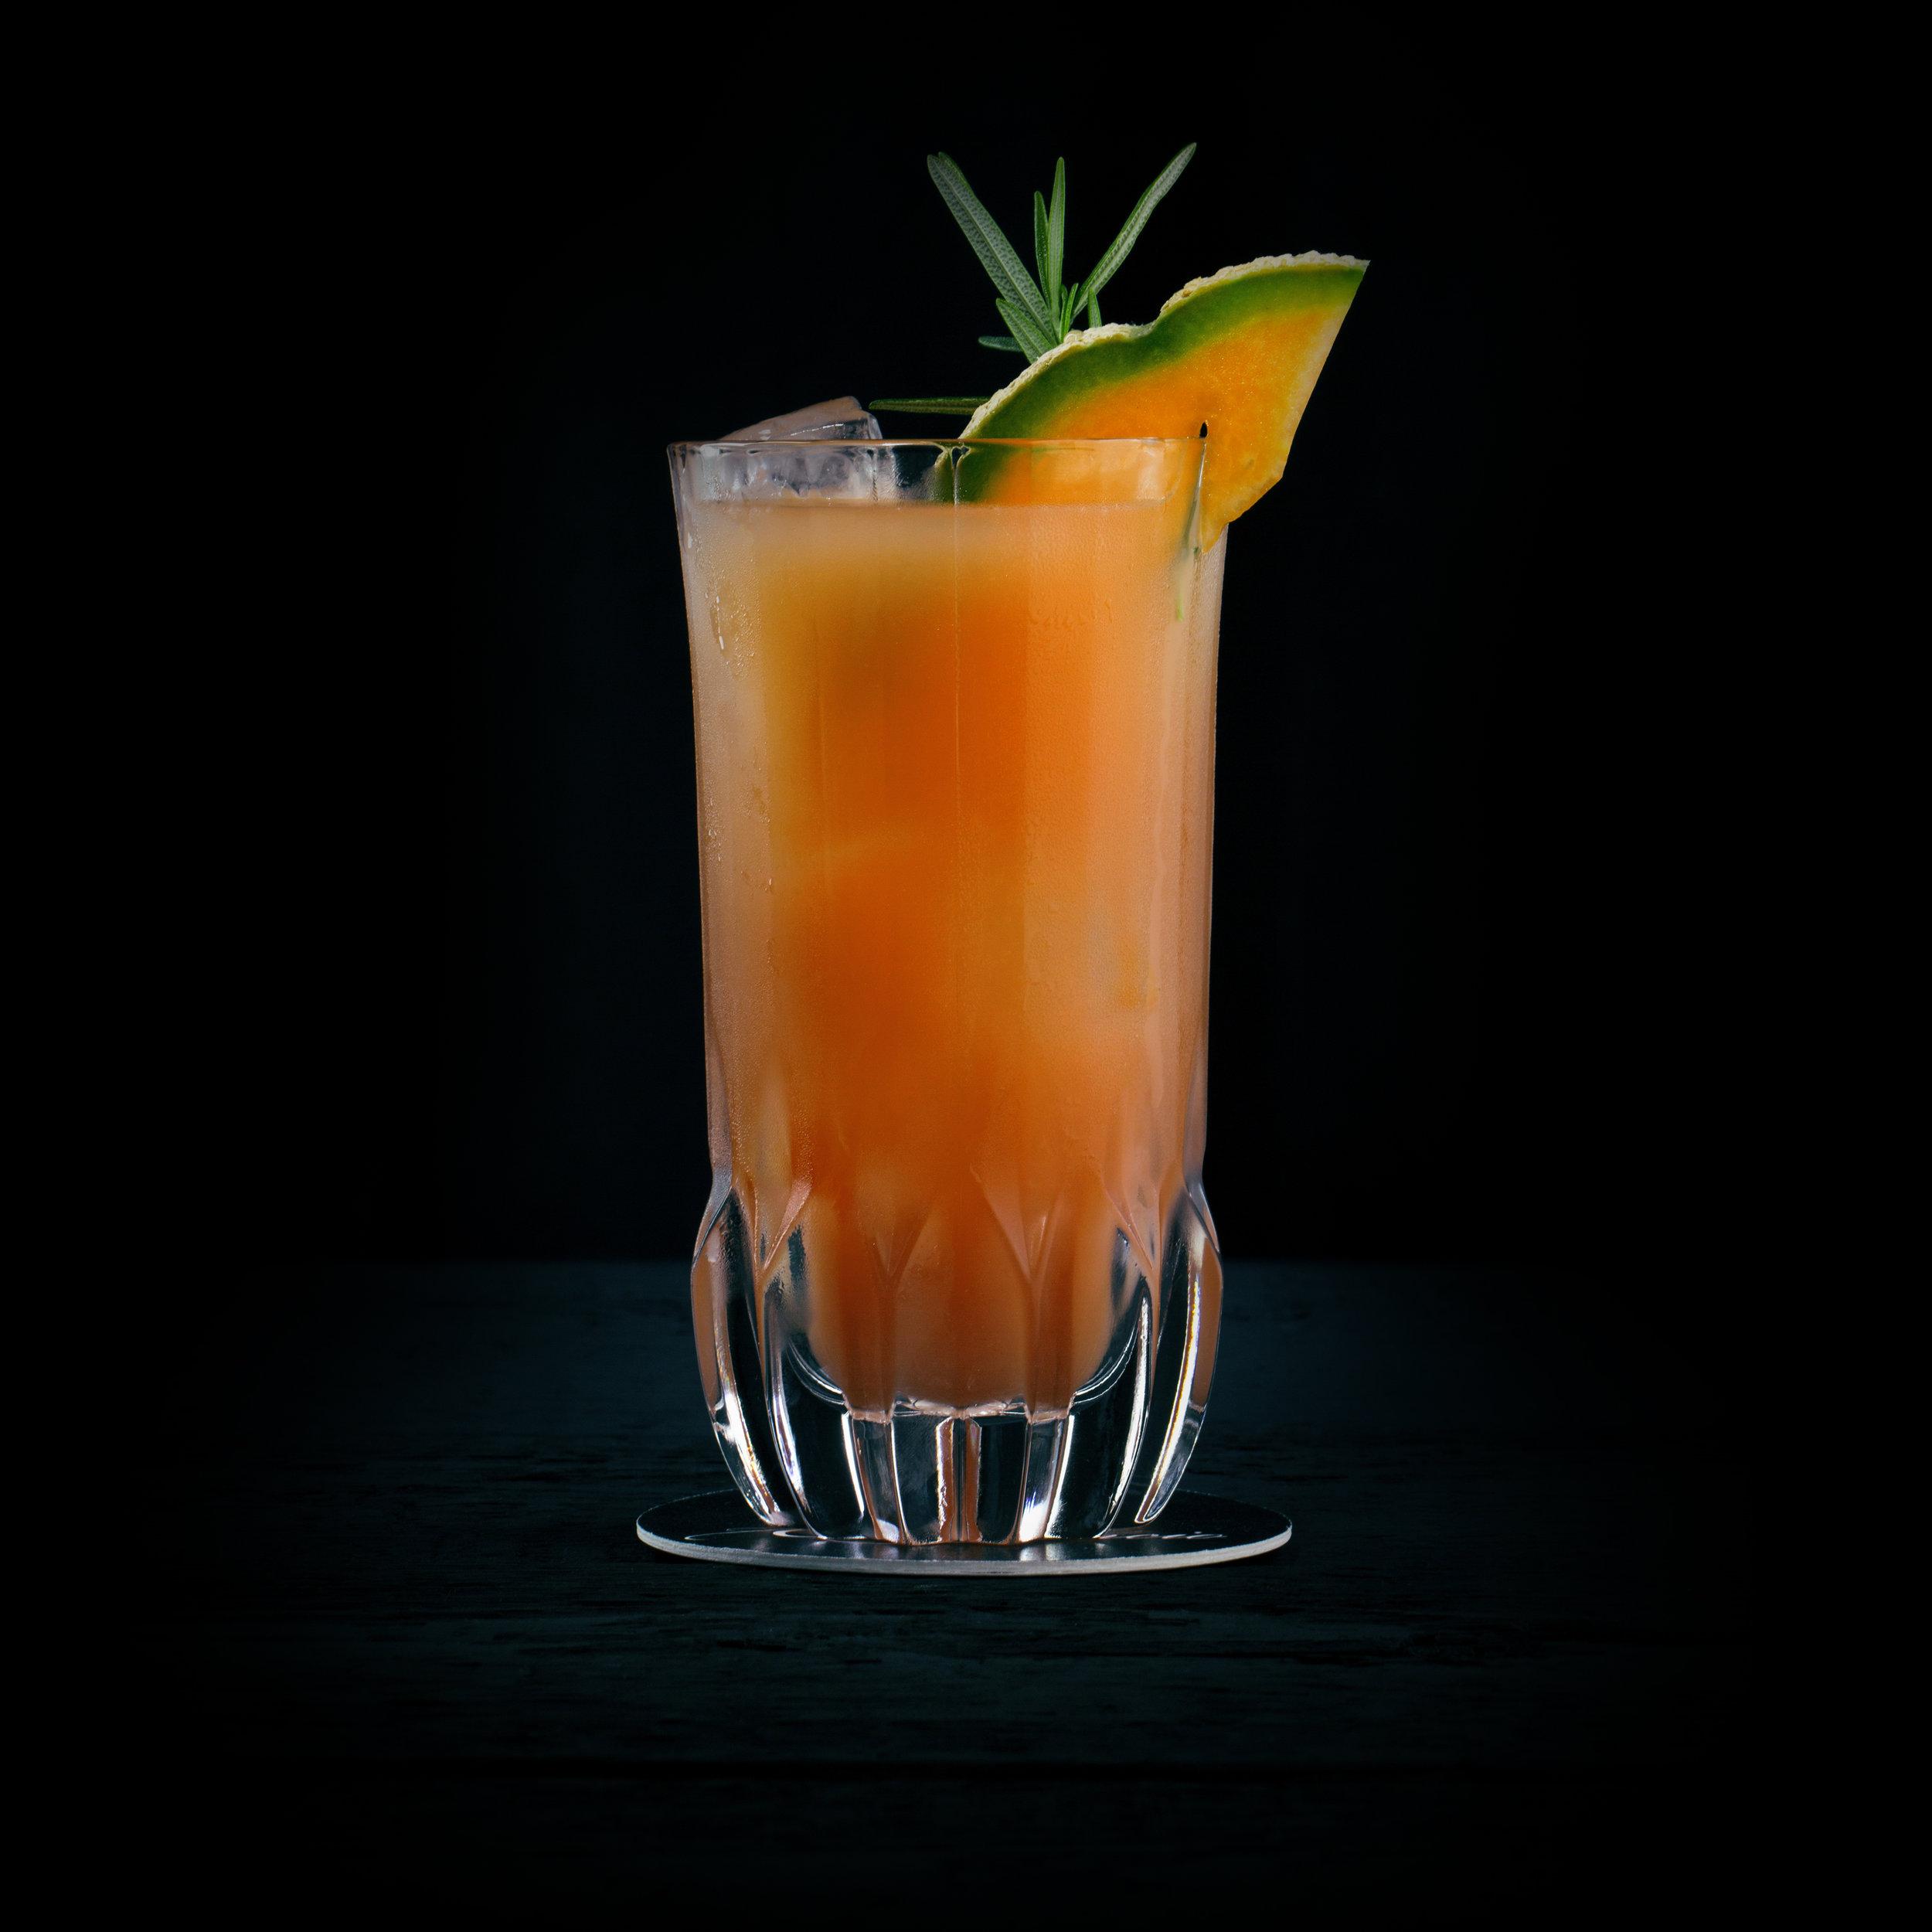 MEGAMELONIAC  INGREDIENTS  - 1.5 oz. El Silencio Espadin - 1 oz. Fresh Lime Juice - 3 oz Cantaloupe Melon Juice - .5 oz Simple Syrup - Dash Vanilla Bitters  METHOD  Shake with Ice & Strain Garnish: Melon and Thyme